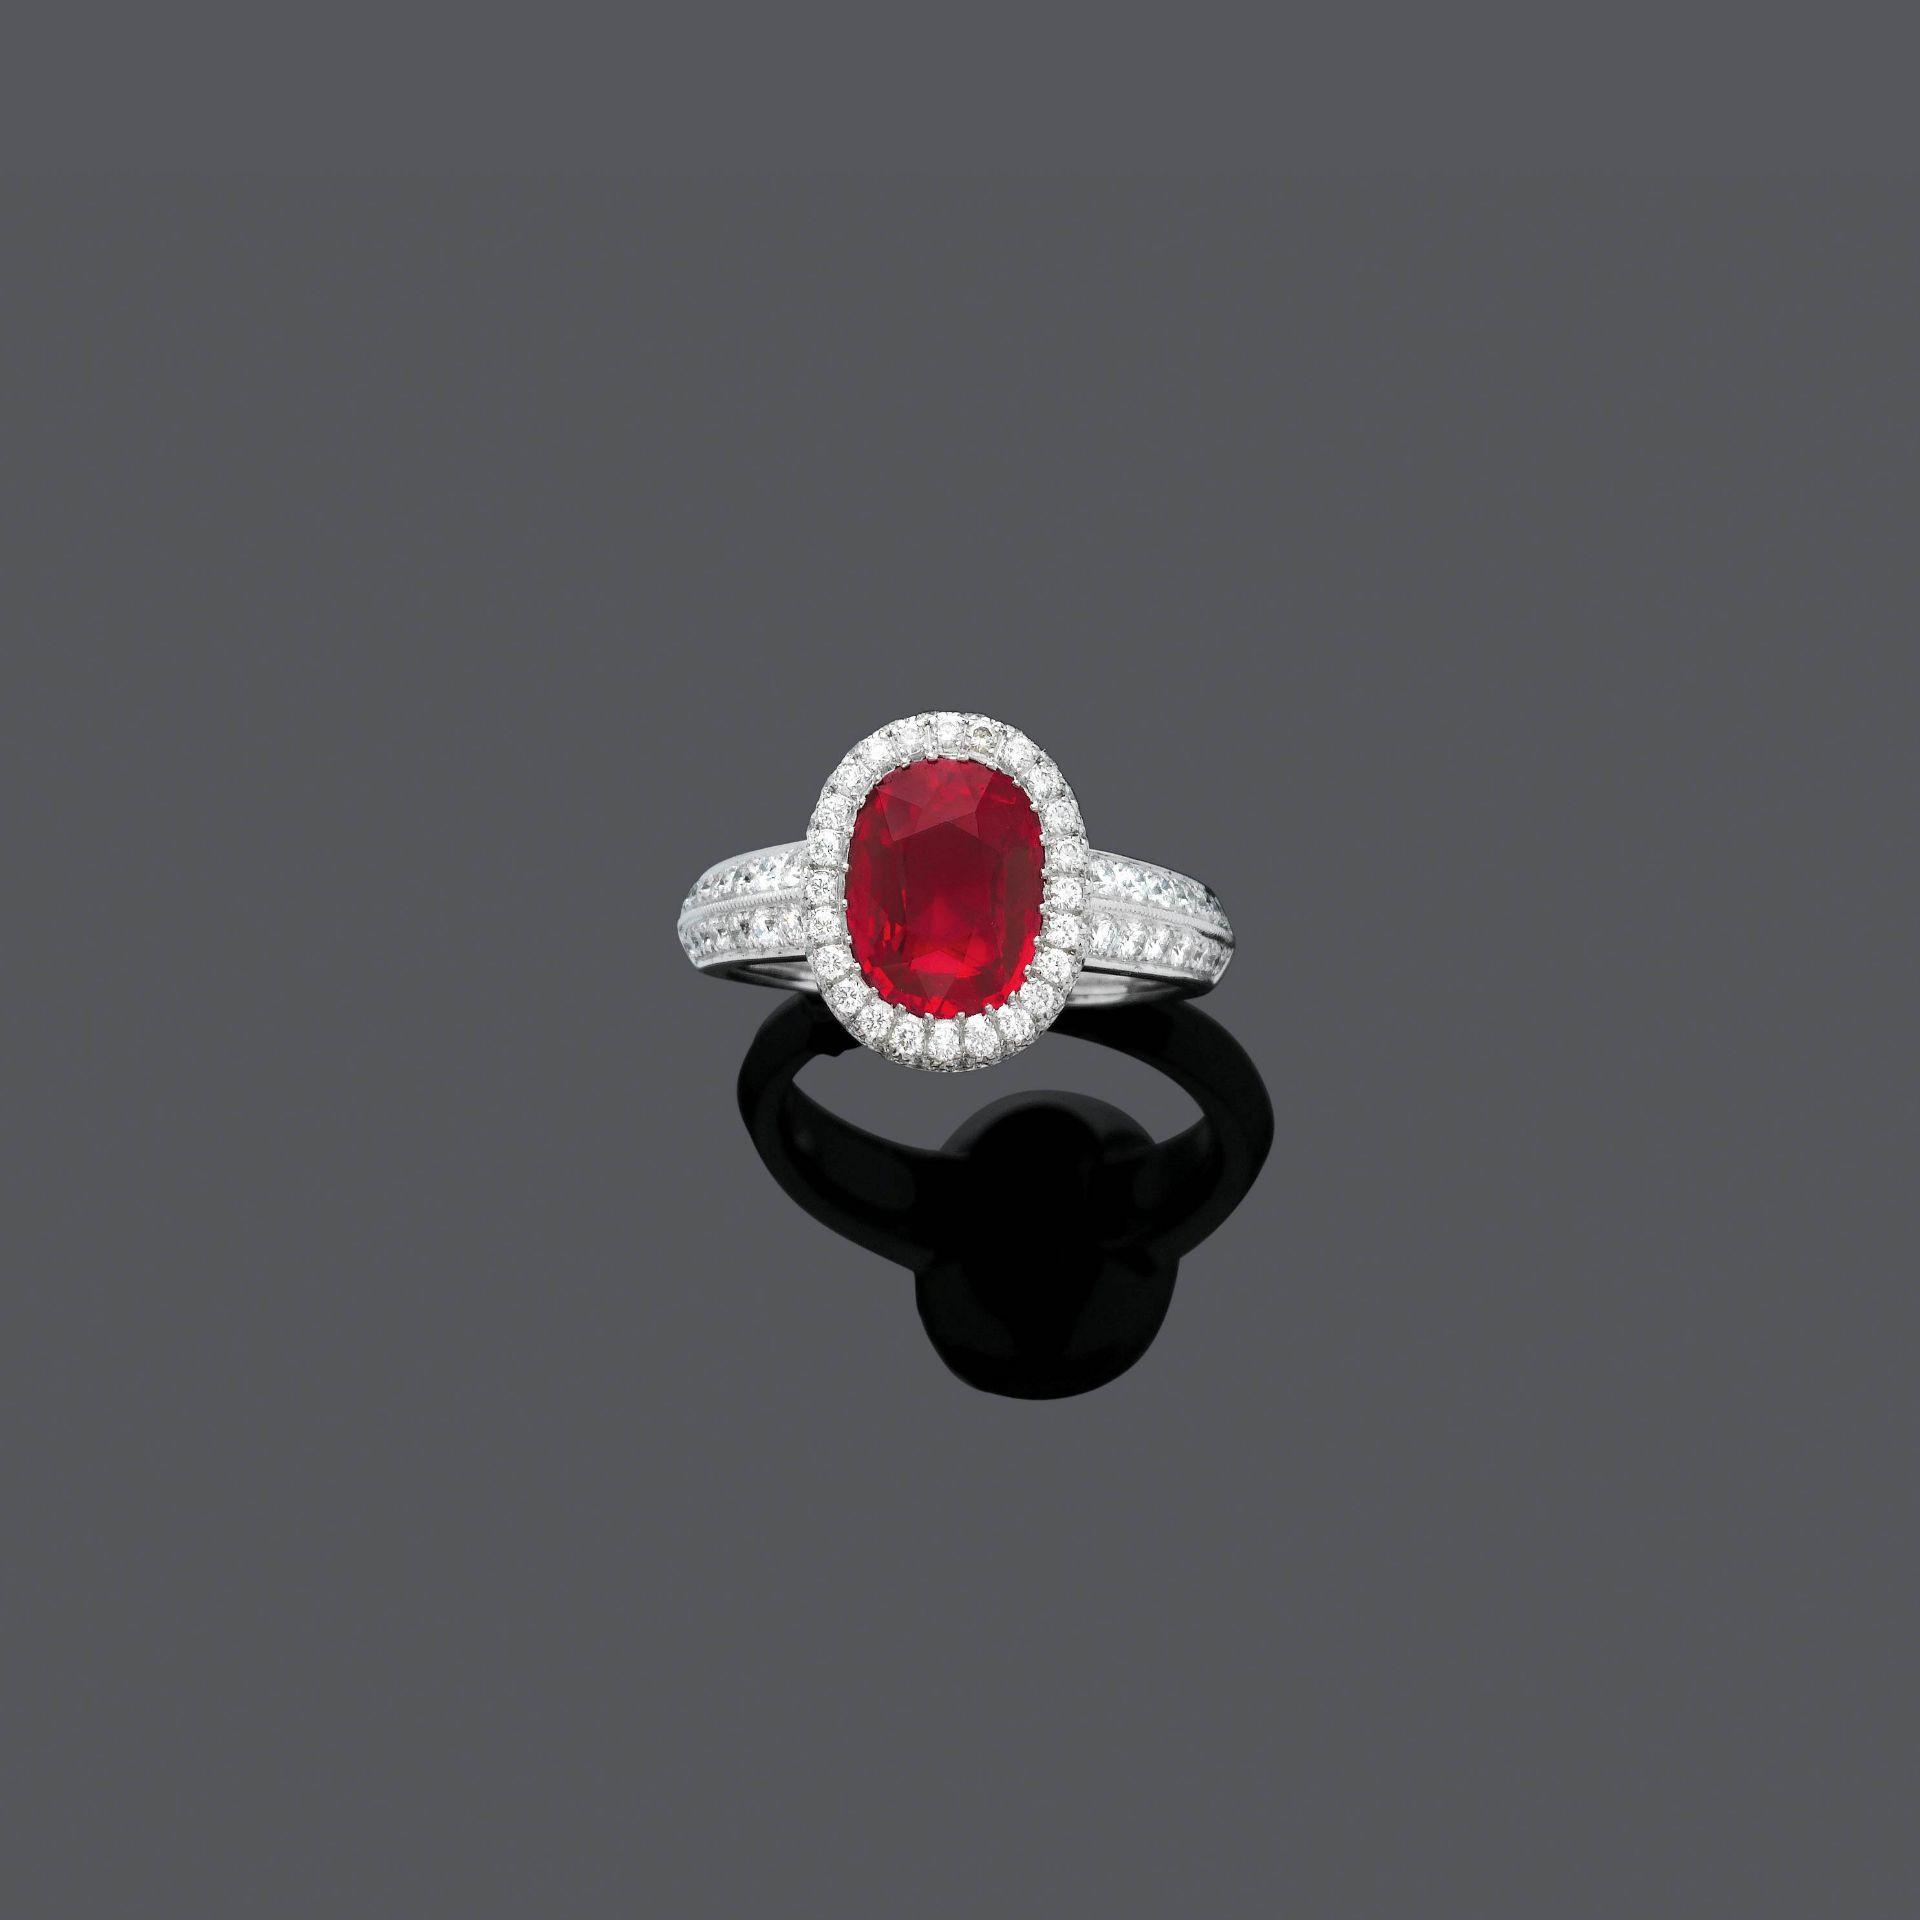 BURMA RUBY AND DIAMOND RING, BY PÉCLARD.